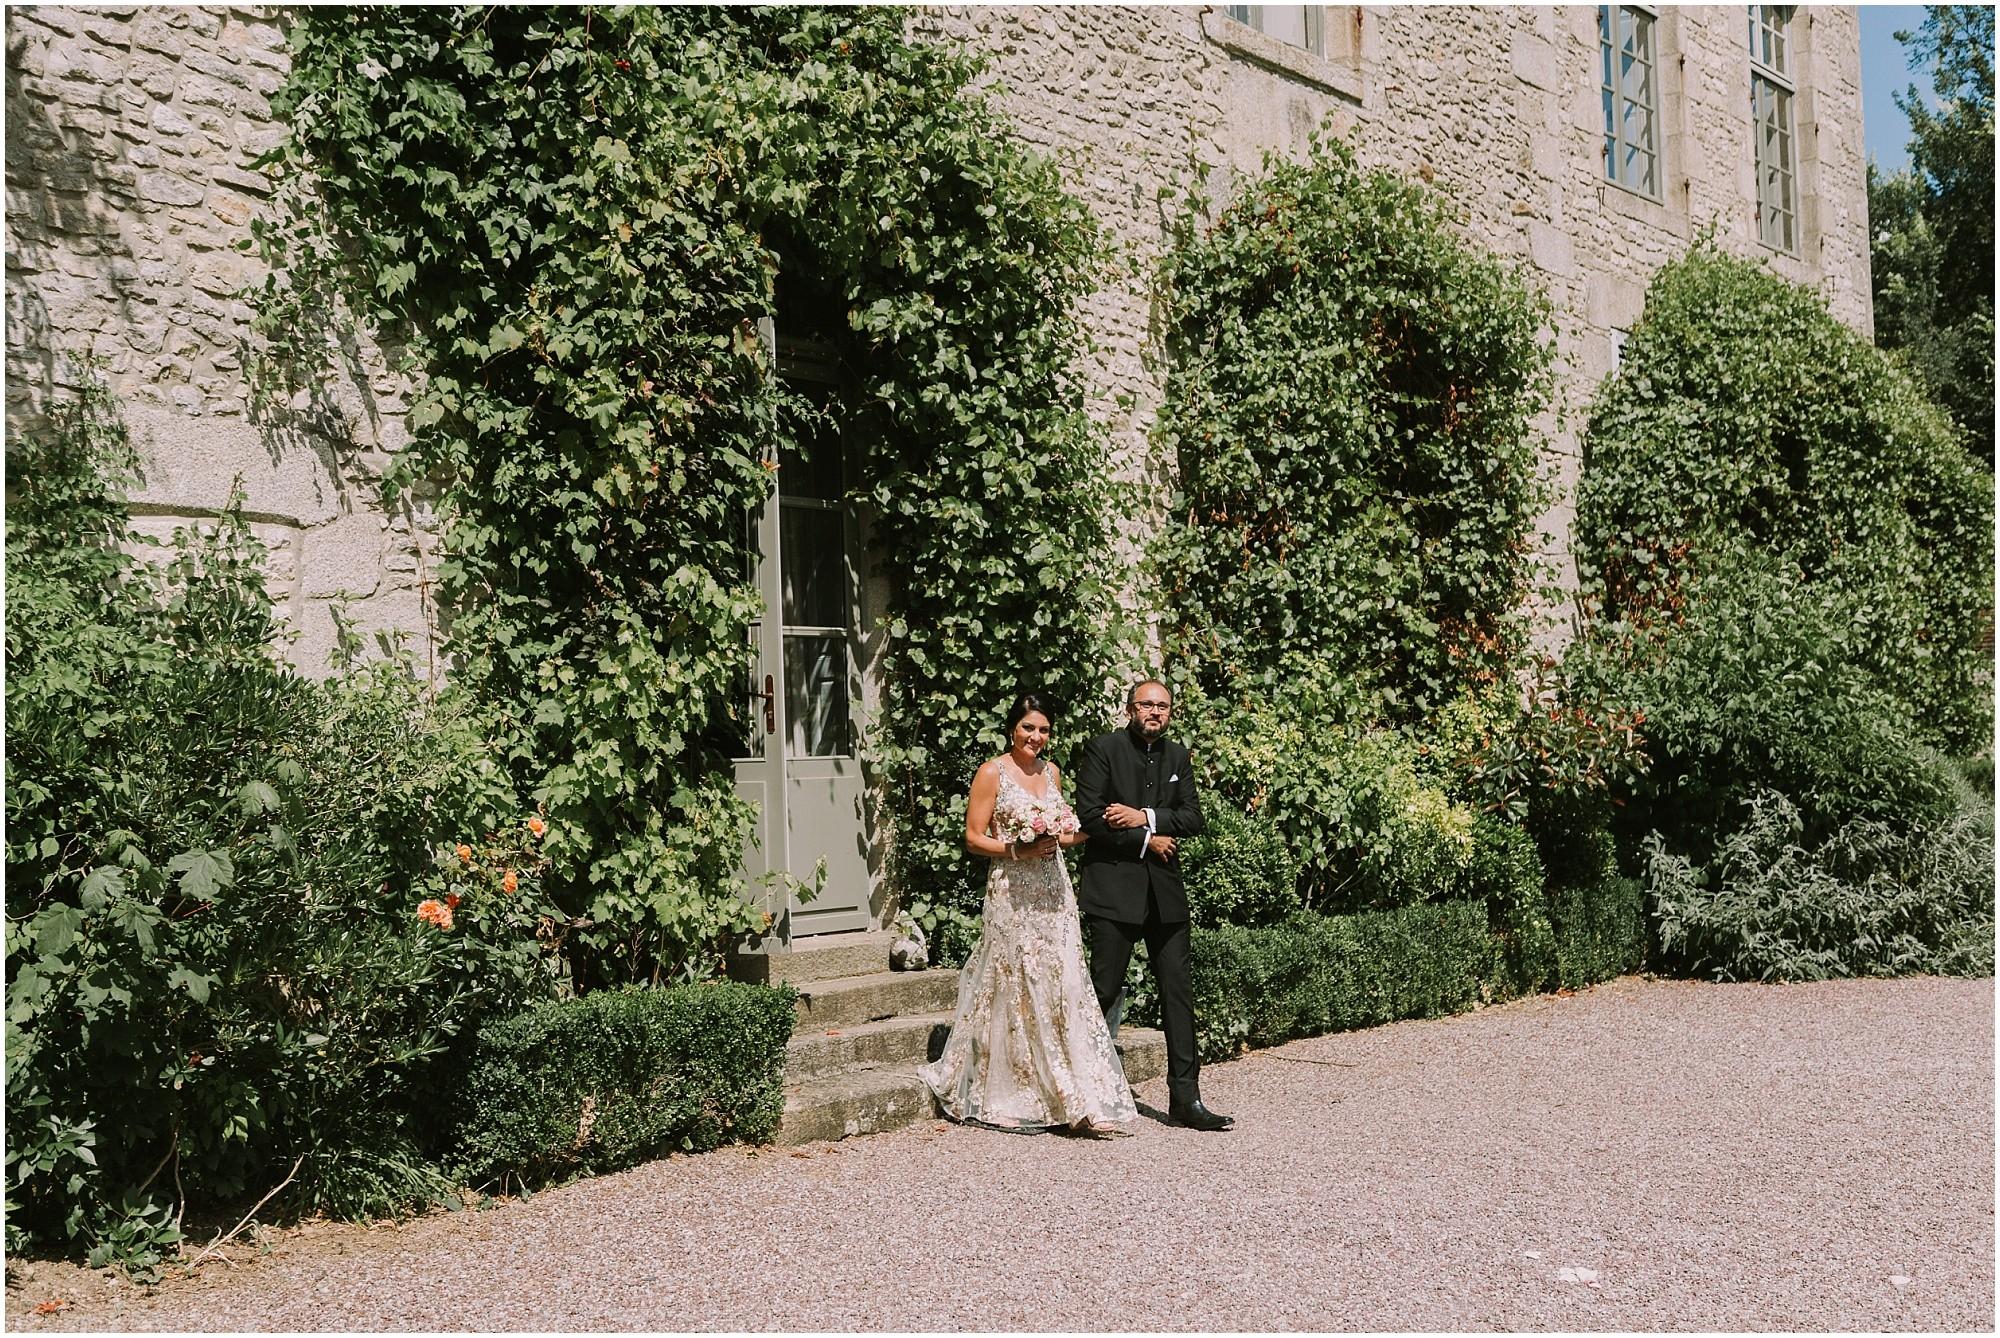 Kateryna-photos-photographer-mariage-chateau-saint-paterne-alencon-normandie-mayenne-le-mans_0073.jpg